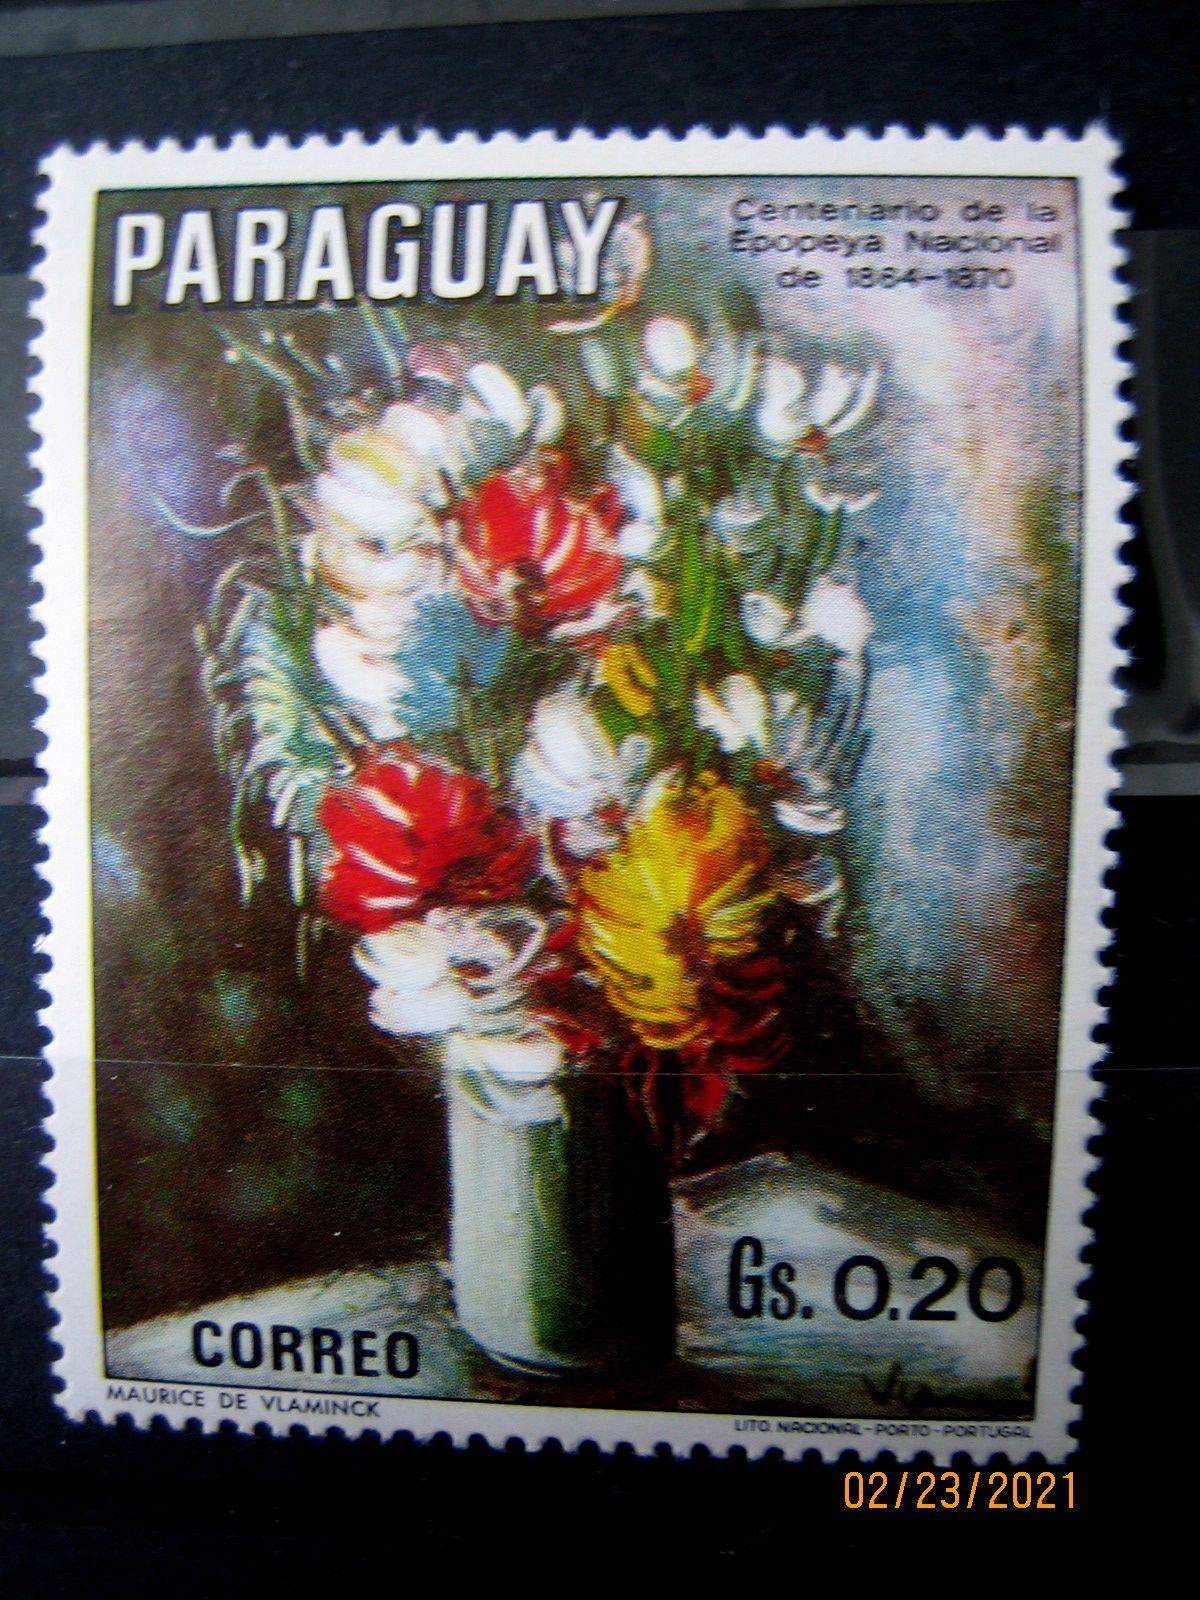 Марка Парагвай, 1970 г. Флора, 100-летие национального эпоса 1864-1870, на марке представлена Цветочная композиция по Вламинку, Mi:PY 2094, Sn:PY 1299c, Yt:PY 1091, номинал — 0.20 Gs (гурани)